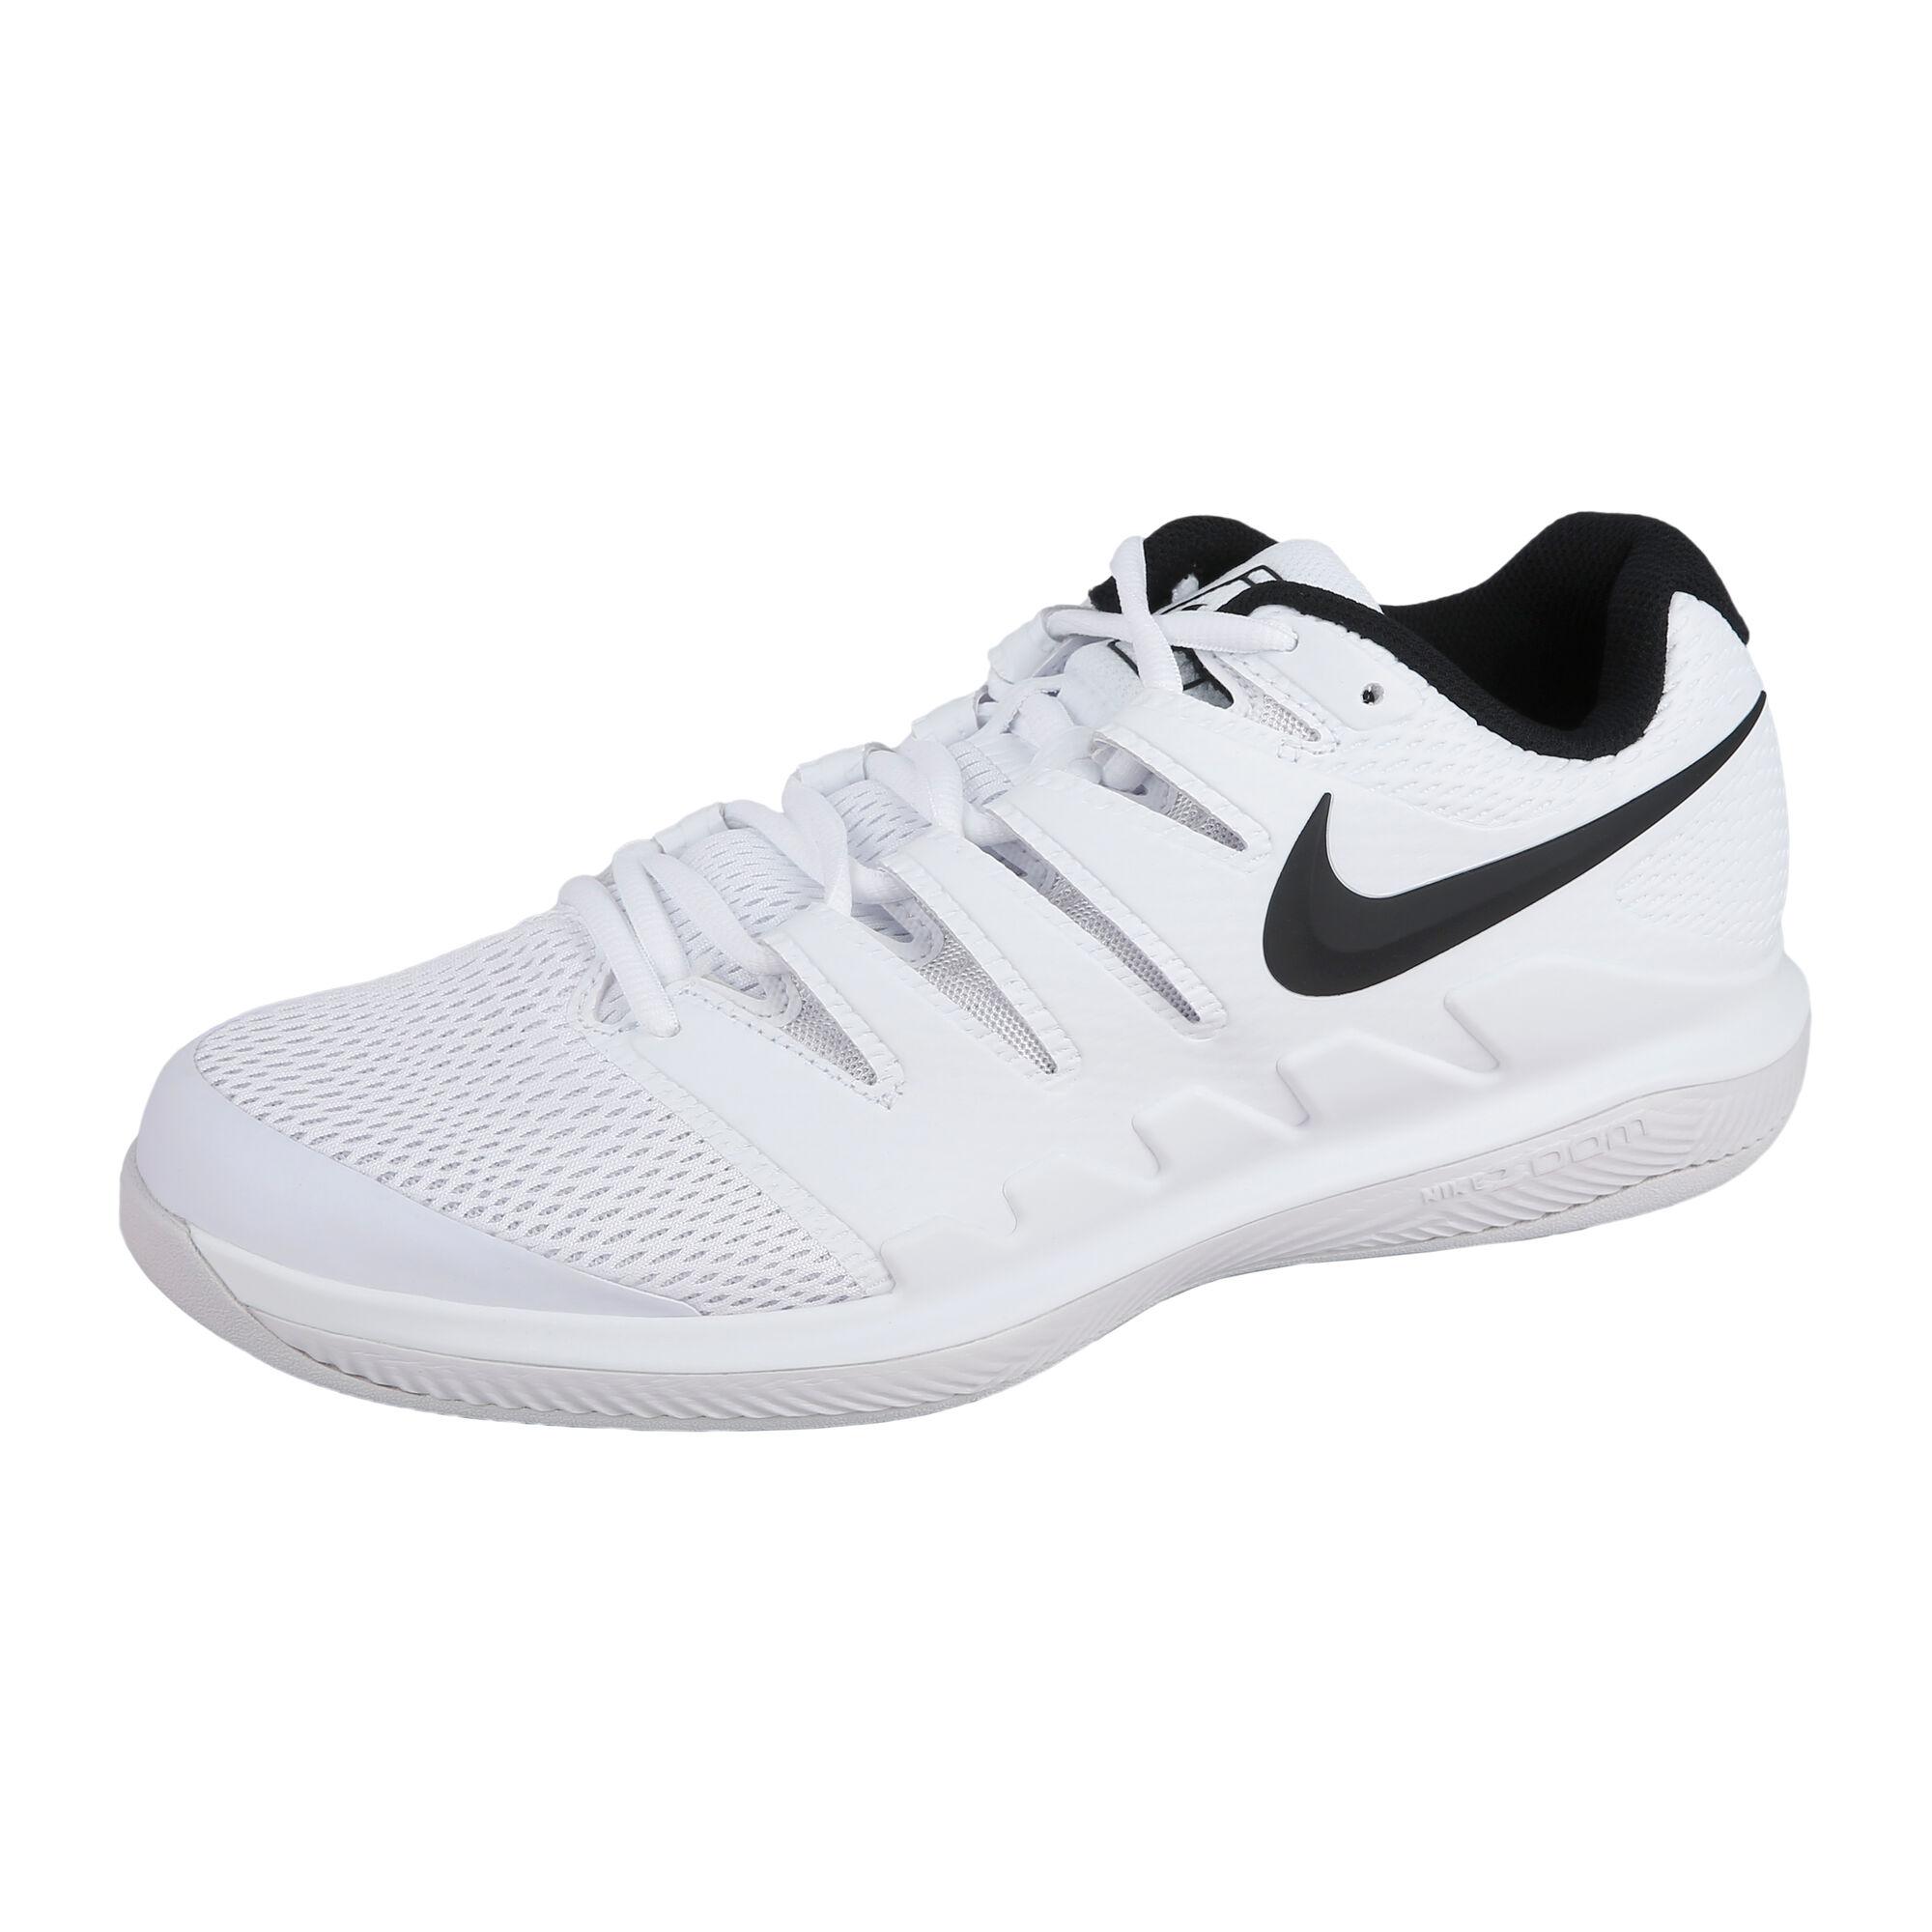 24e0644ab6 Nike Air Zoom Vapor 10 Carpet Scarpa Per Tappeto Uomini - Bianco ...